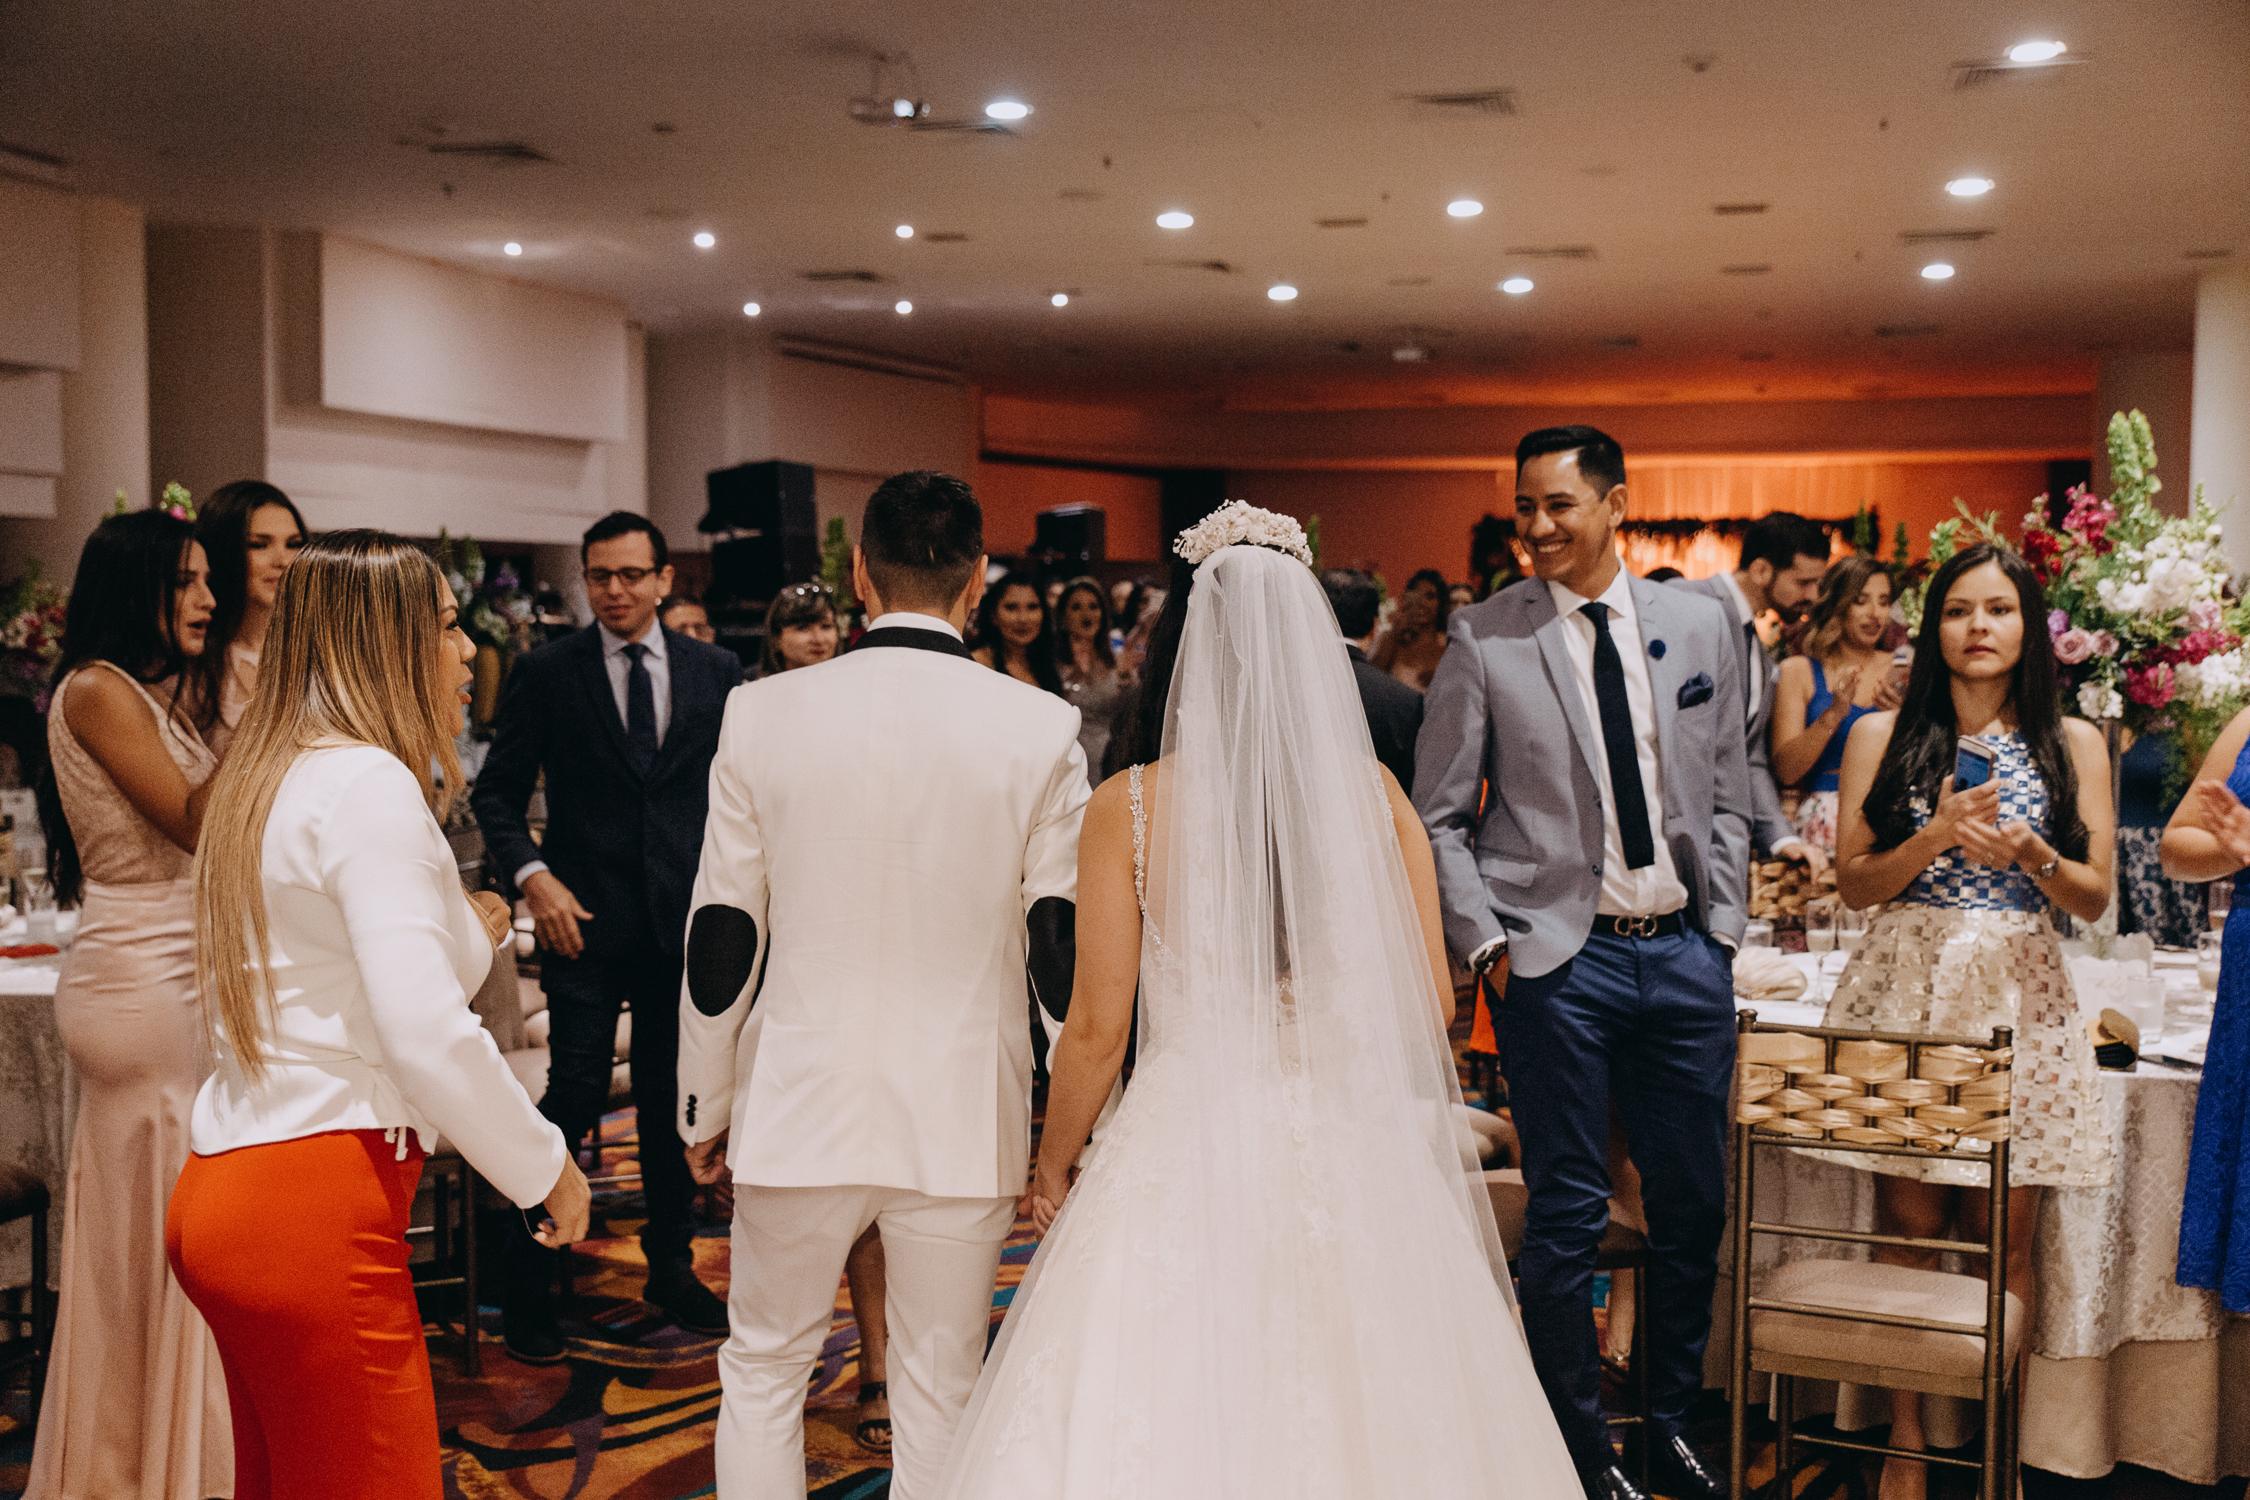 Michelle-Agurto-Fotografia-Bodas-Ecuador-Destination-Wedding-Photographer-Daniela-Dirk-42.JPG